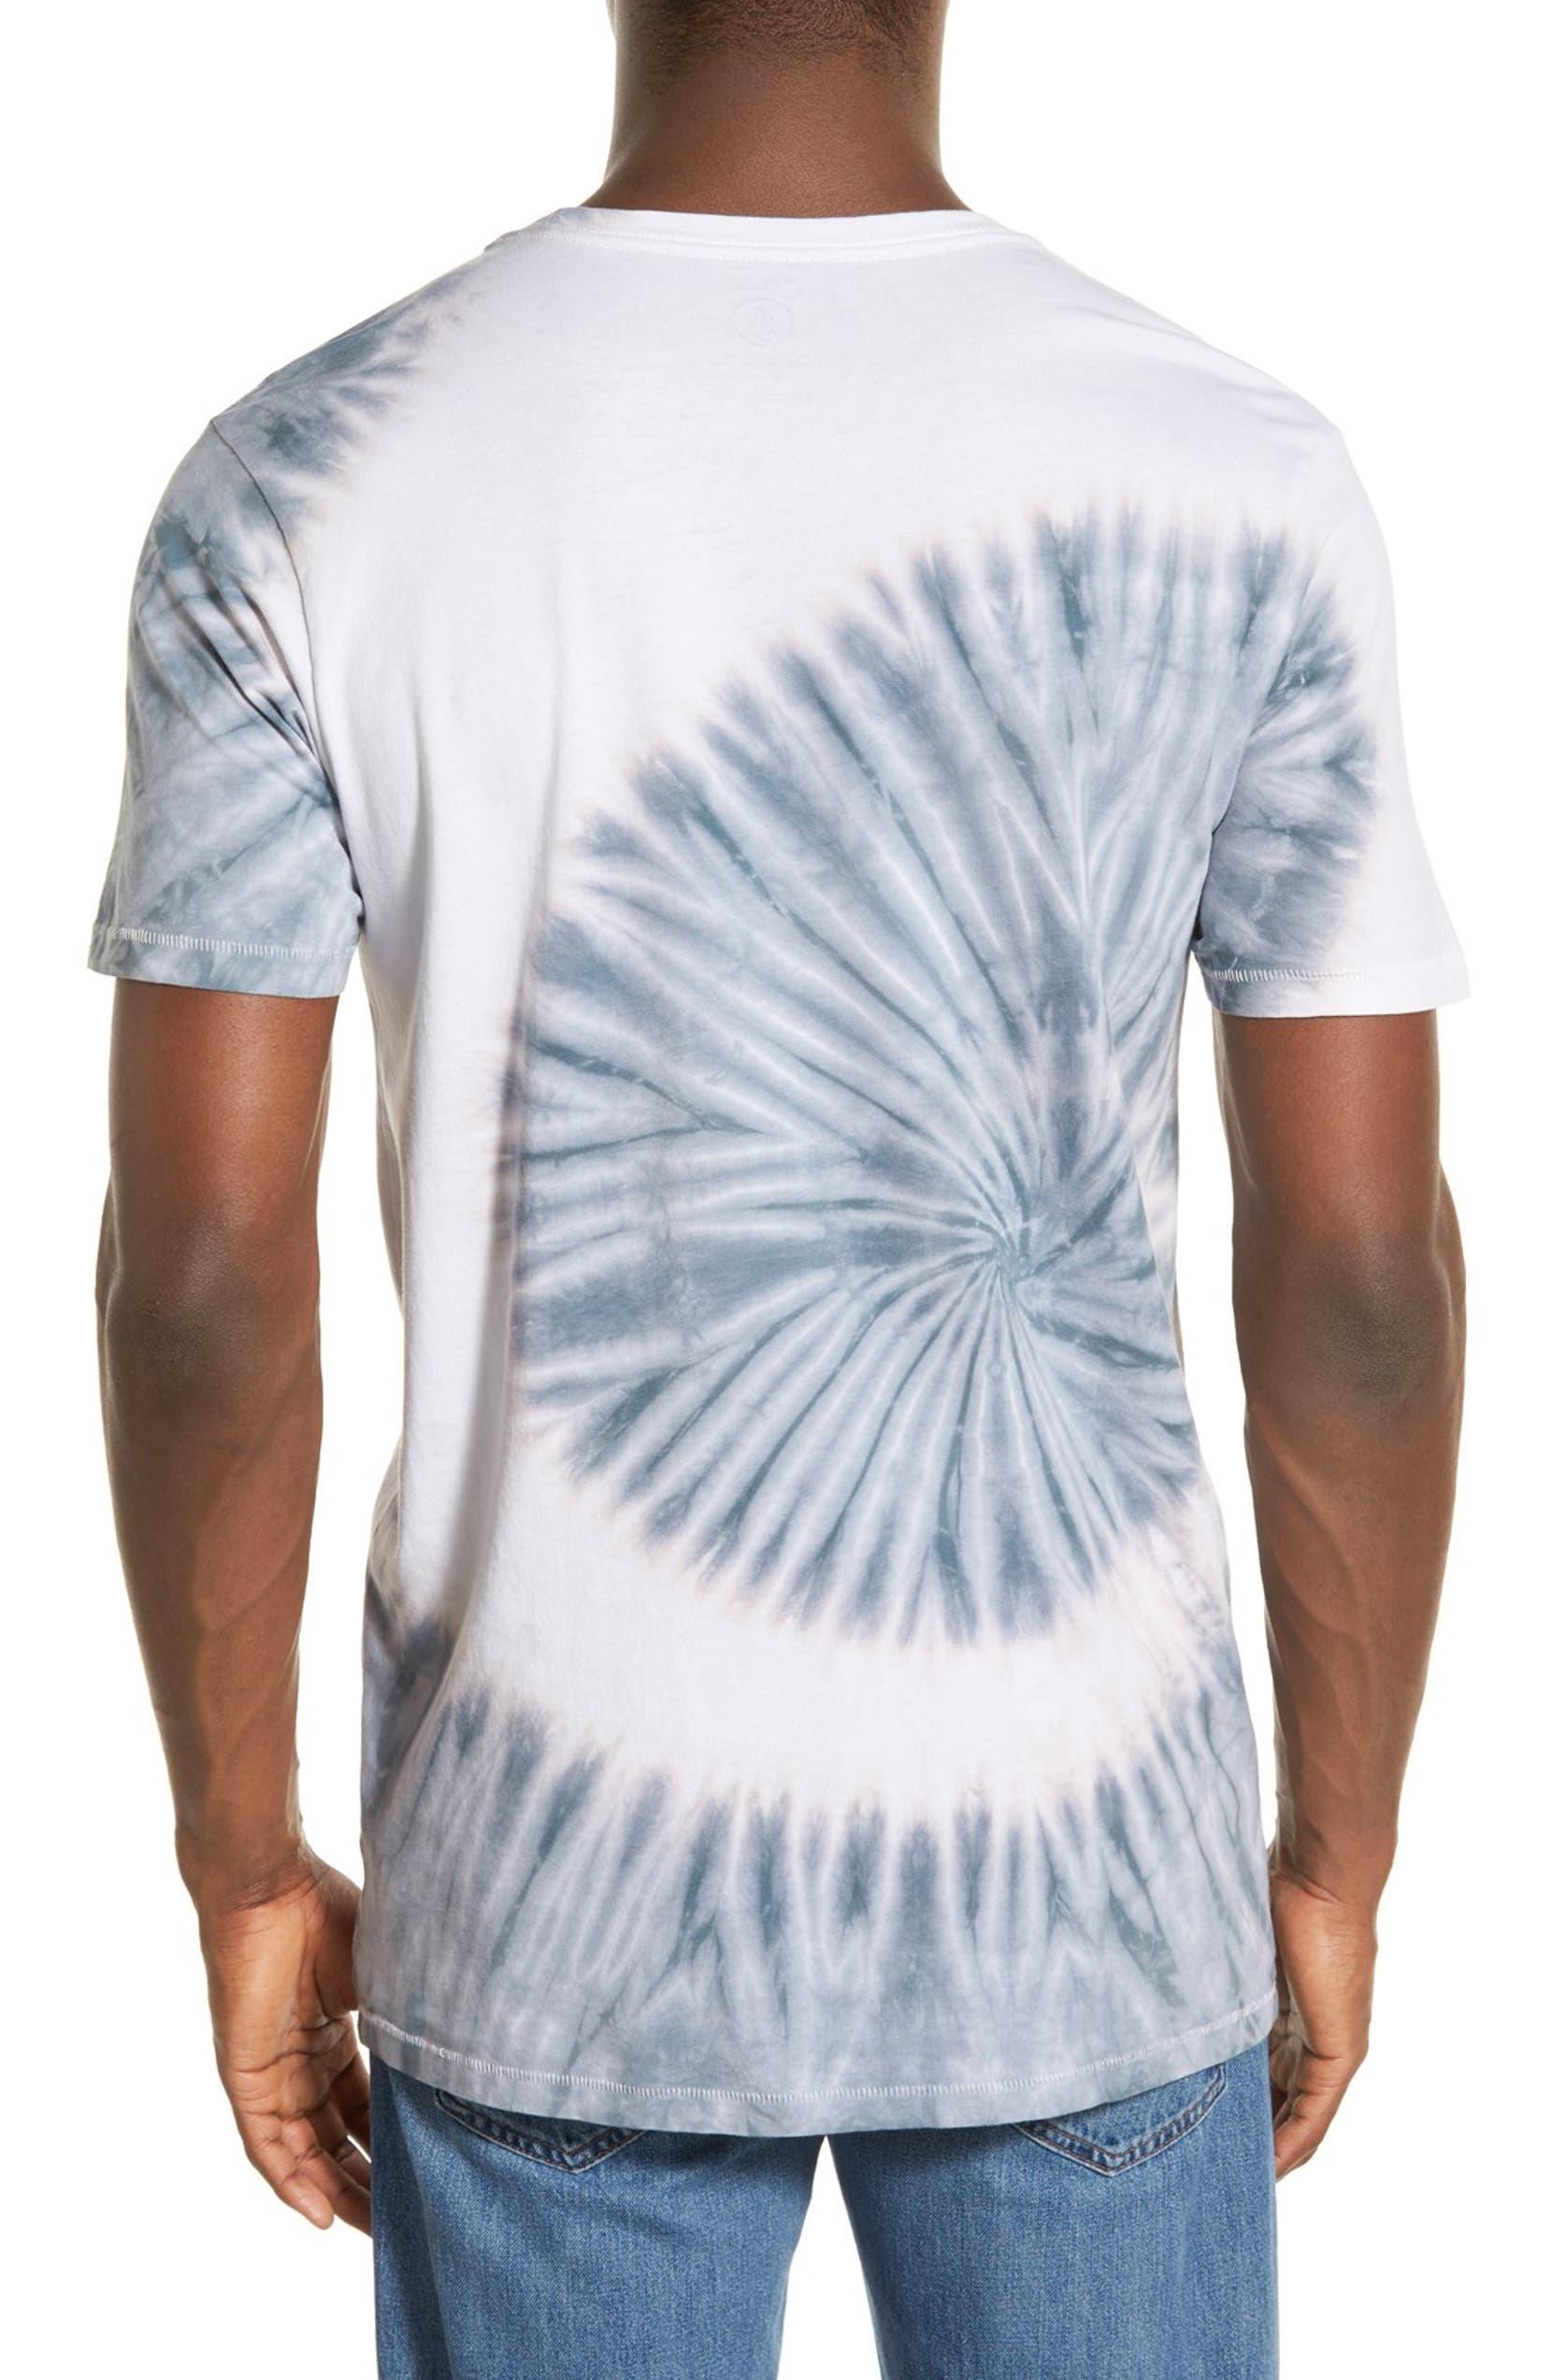 9c5222c50 Volcom 'Club Destroy' Resin Swirl Graphic T-Shirt | Nordstrom